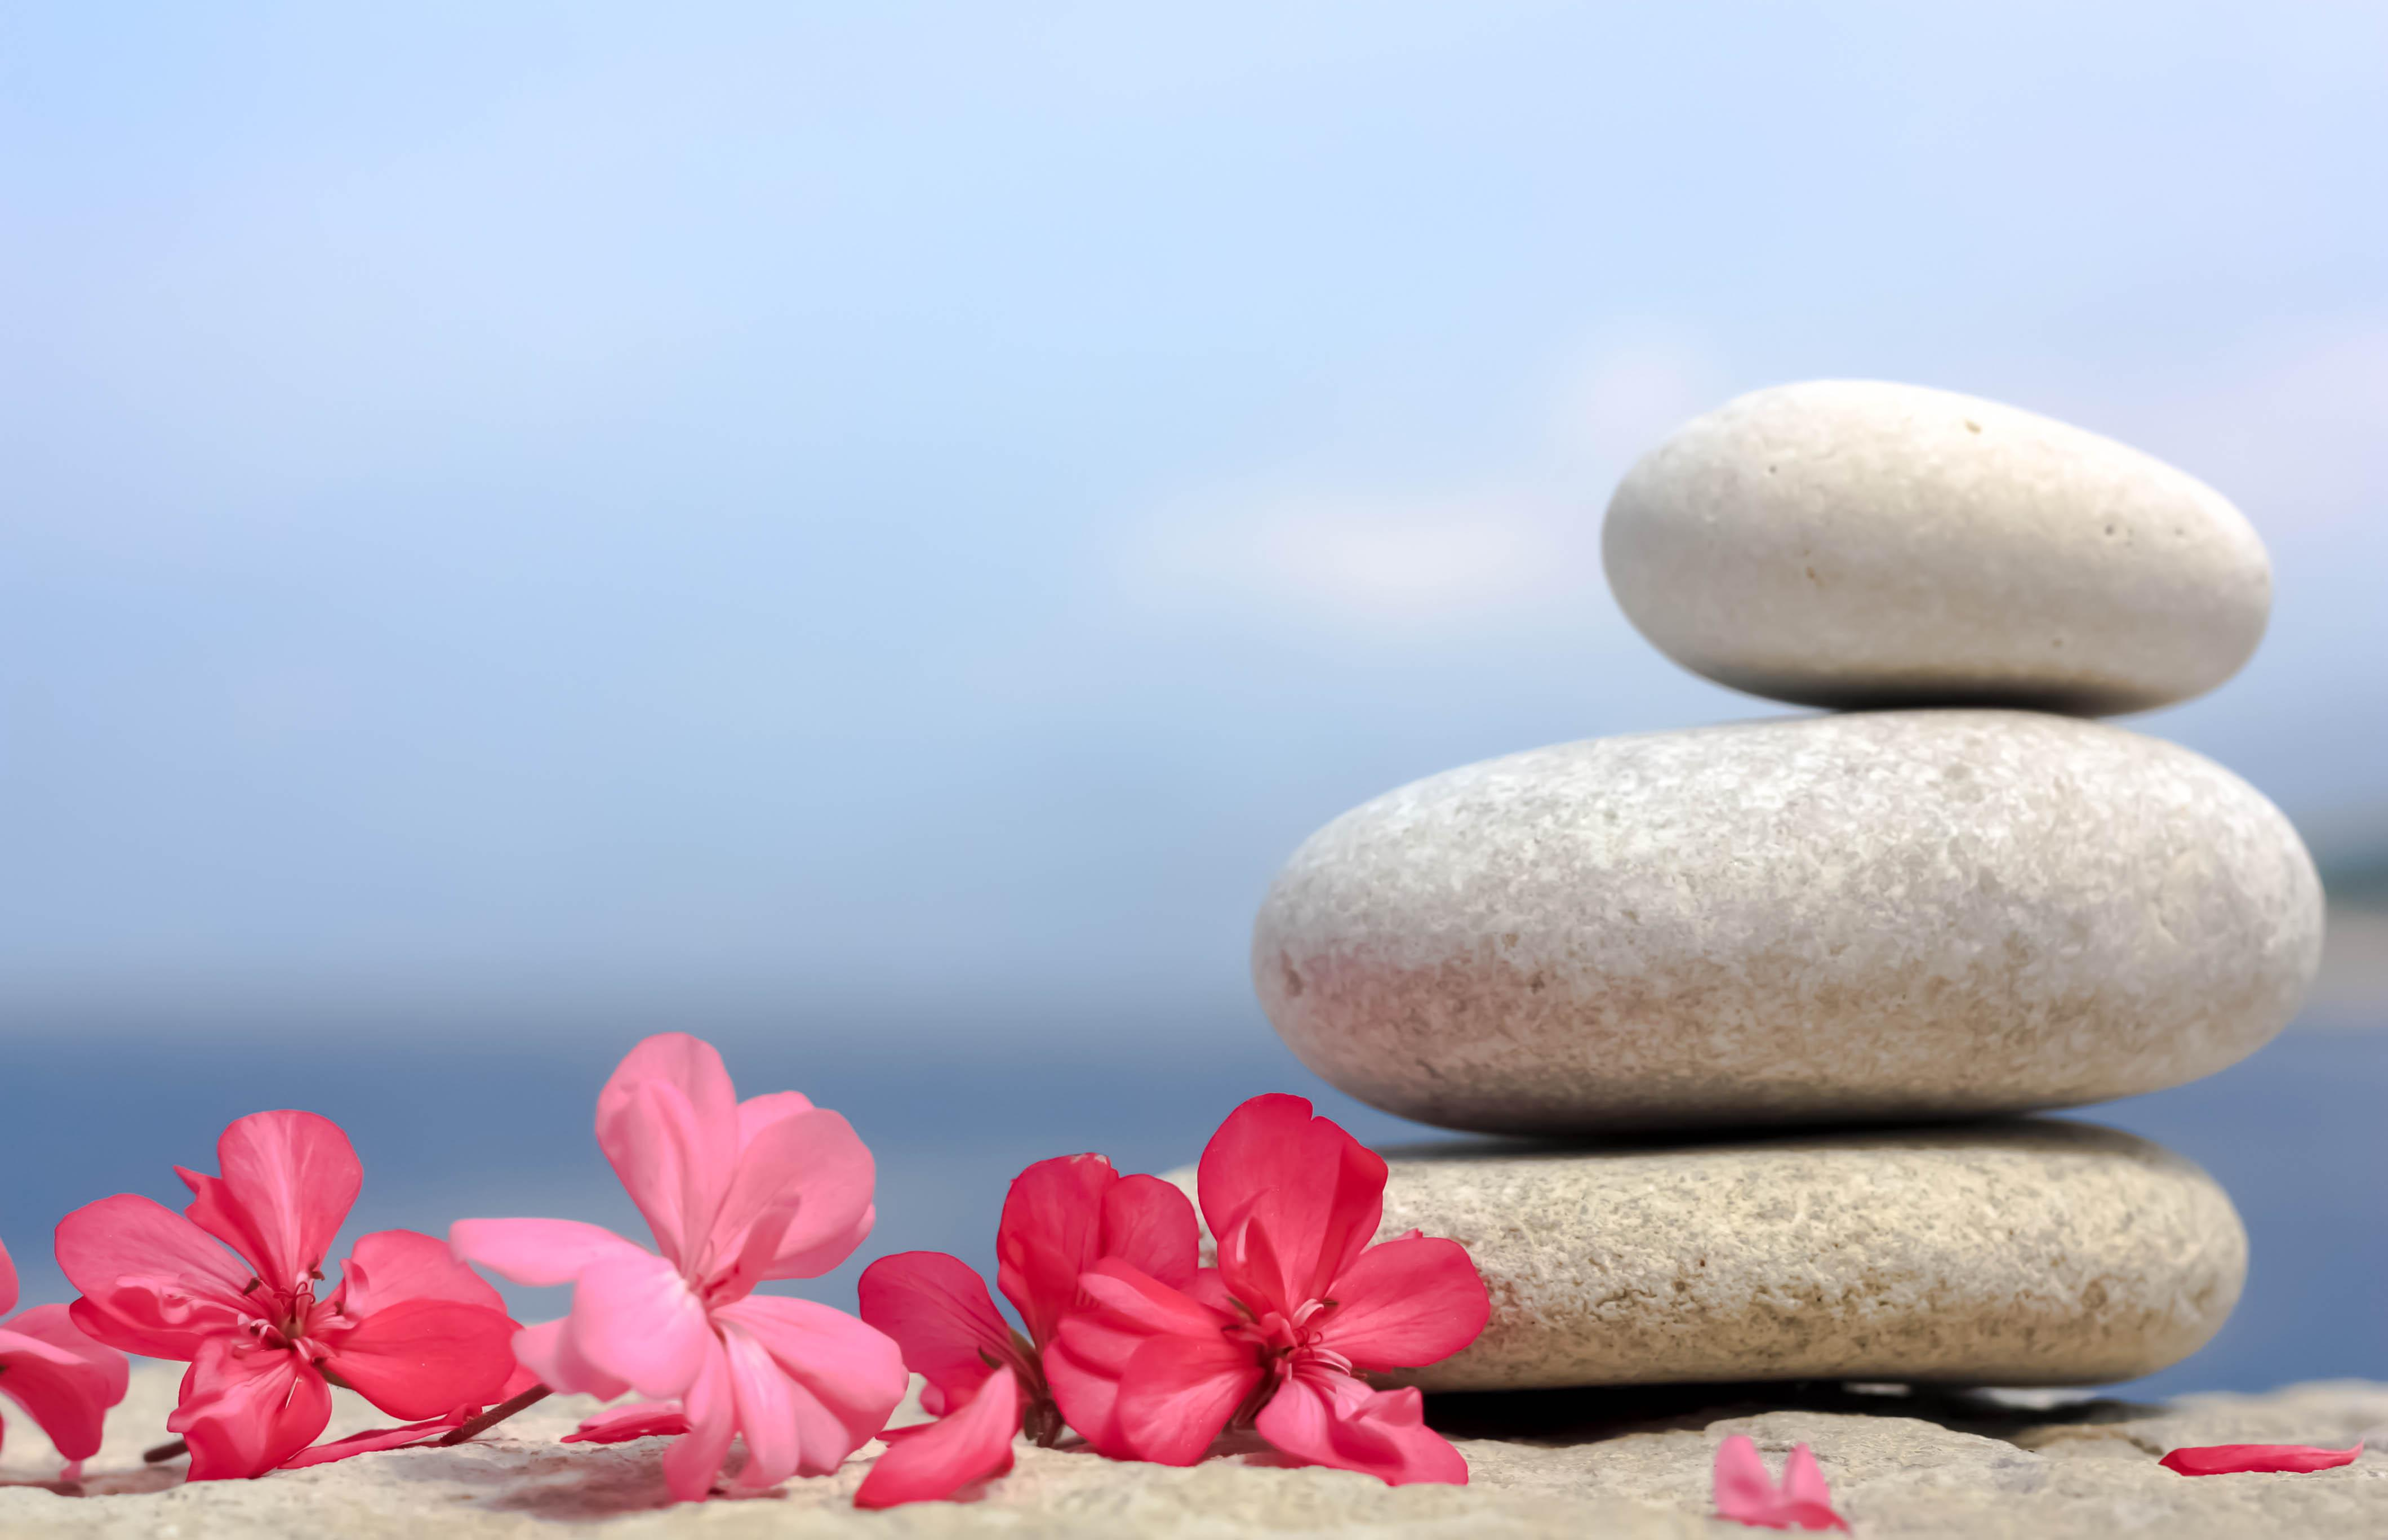 Six Pillars of Bhakti Yoga with Raghunath Cappo